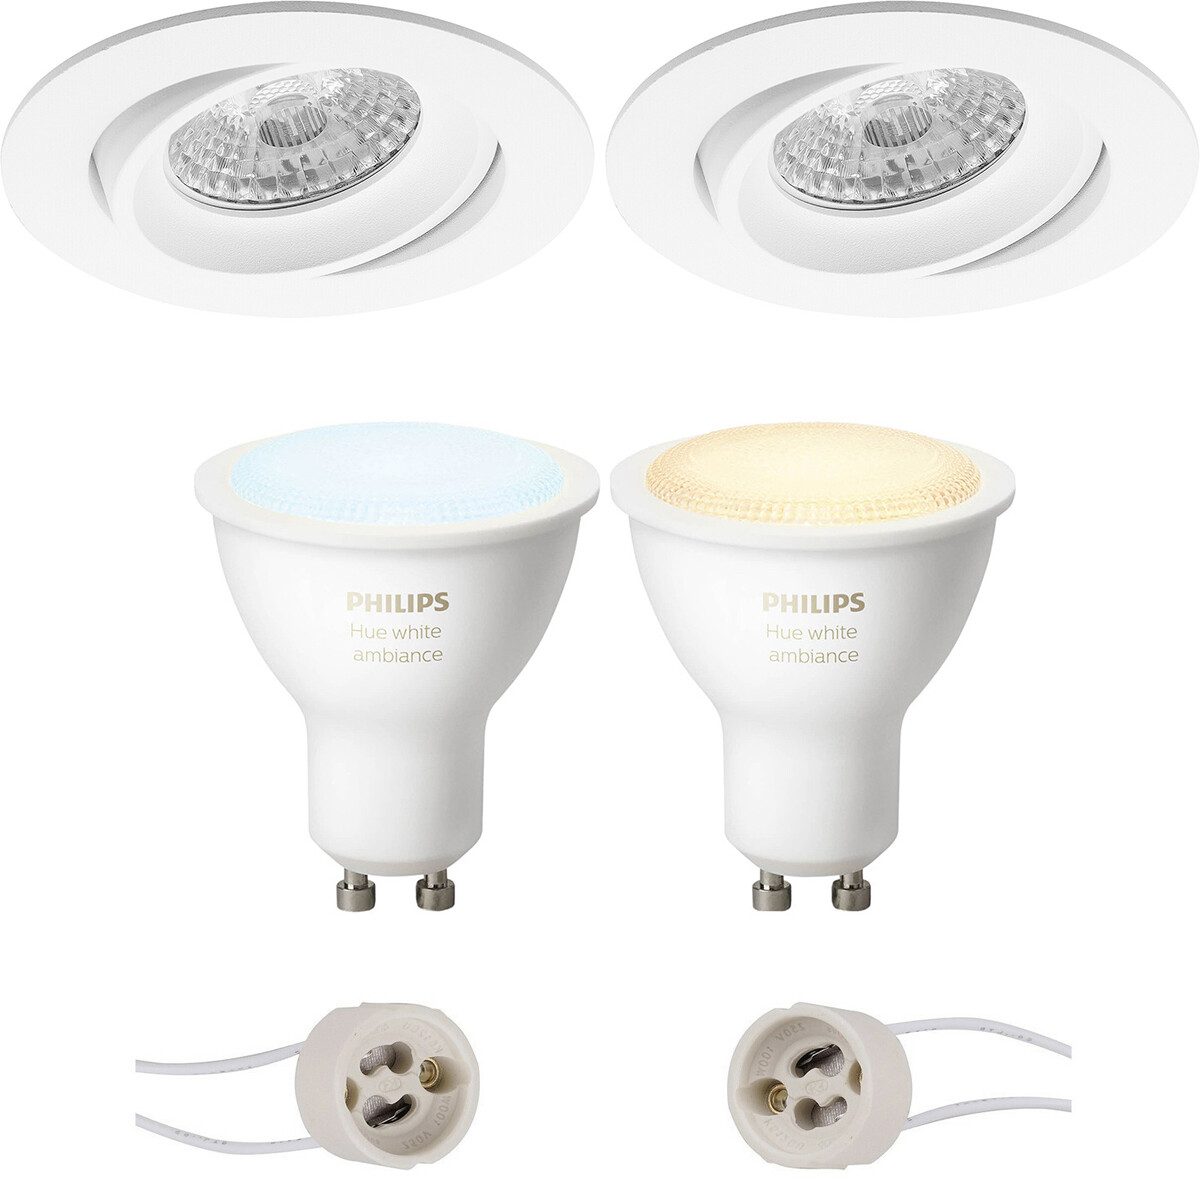 Pragmi Delton Pro - Inbouw Rond - Mat Wit - Kantelbaar - Ø82mm - Philips Hue - LED Spot Set GU10 - W